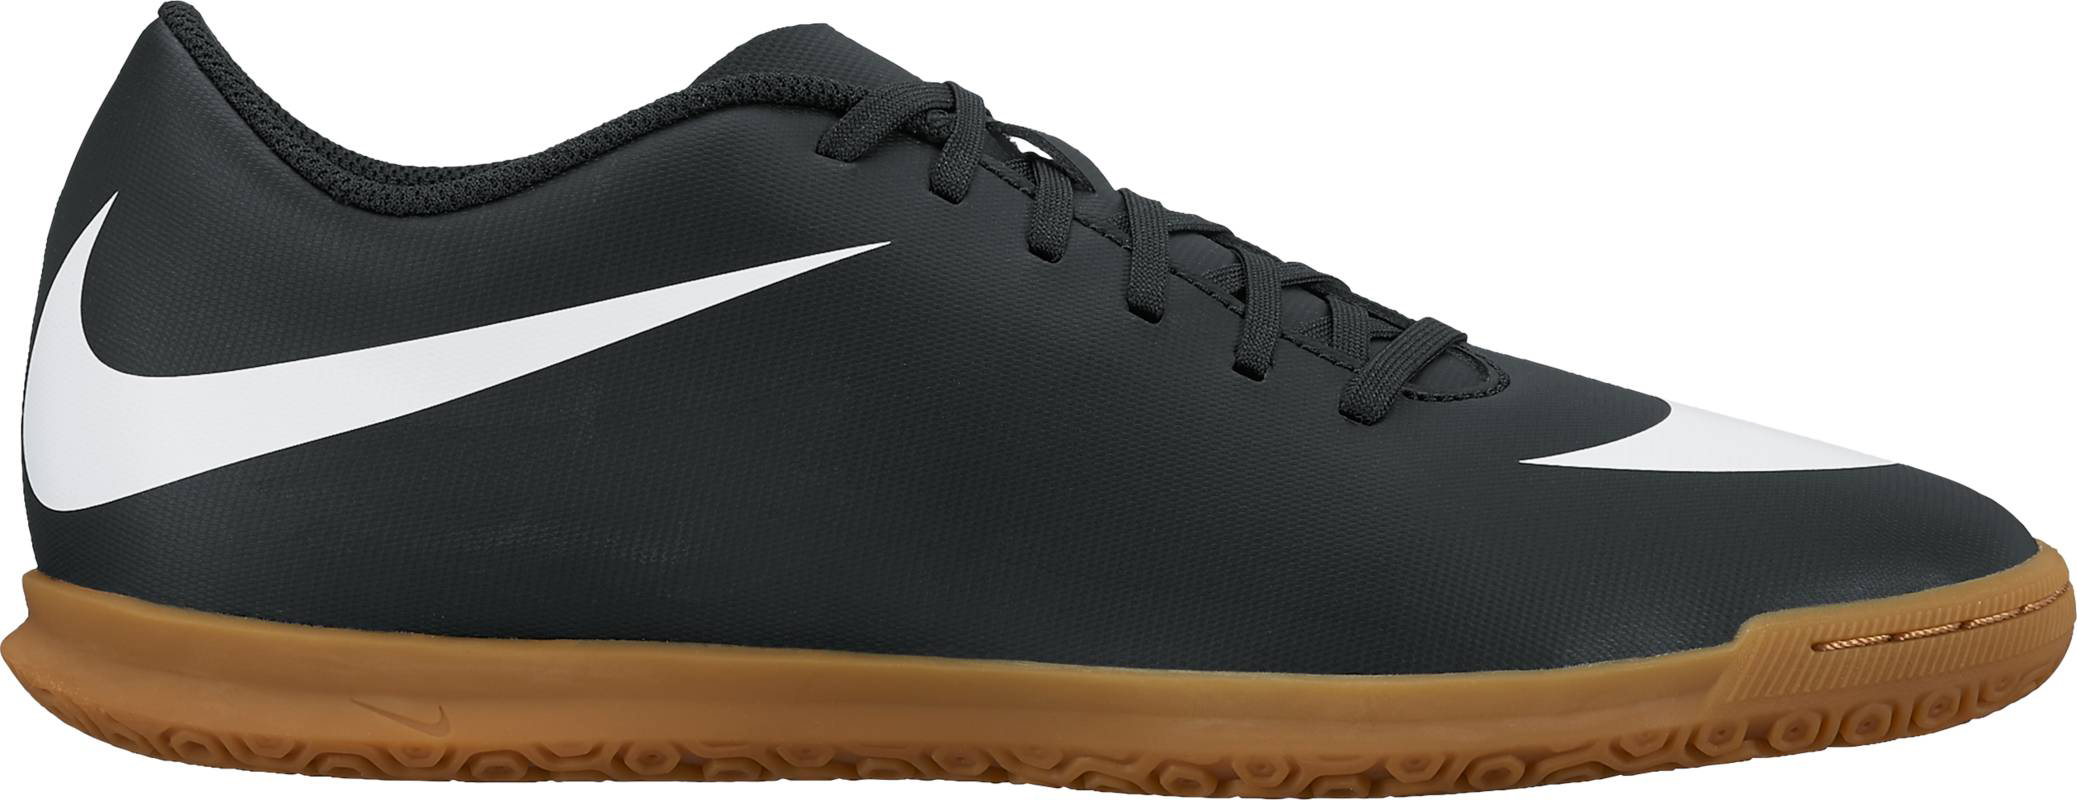 Бутсы мужские Nike Bravatax Ii Ic, цвет: черный. 844441-001. Размер 12 (45)844441-001